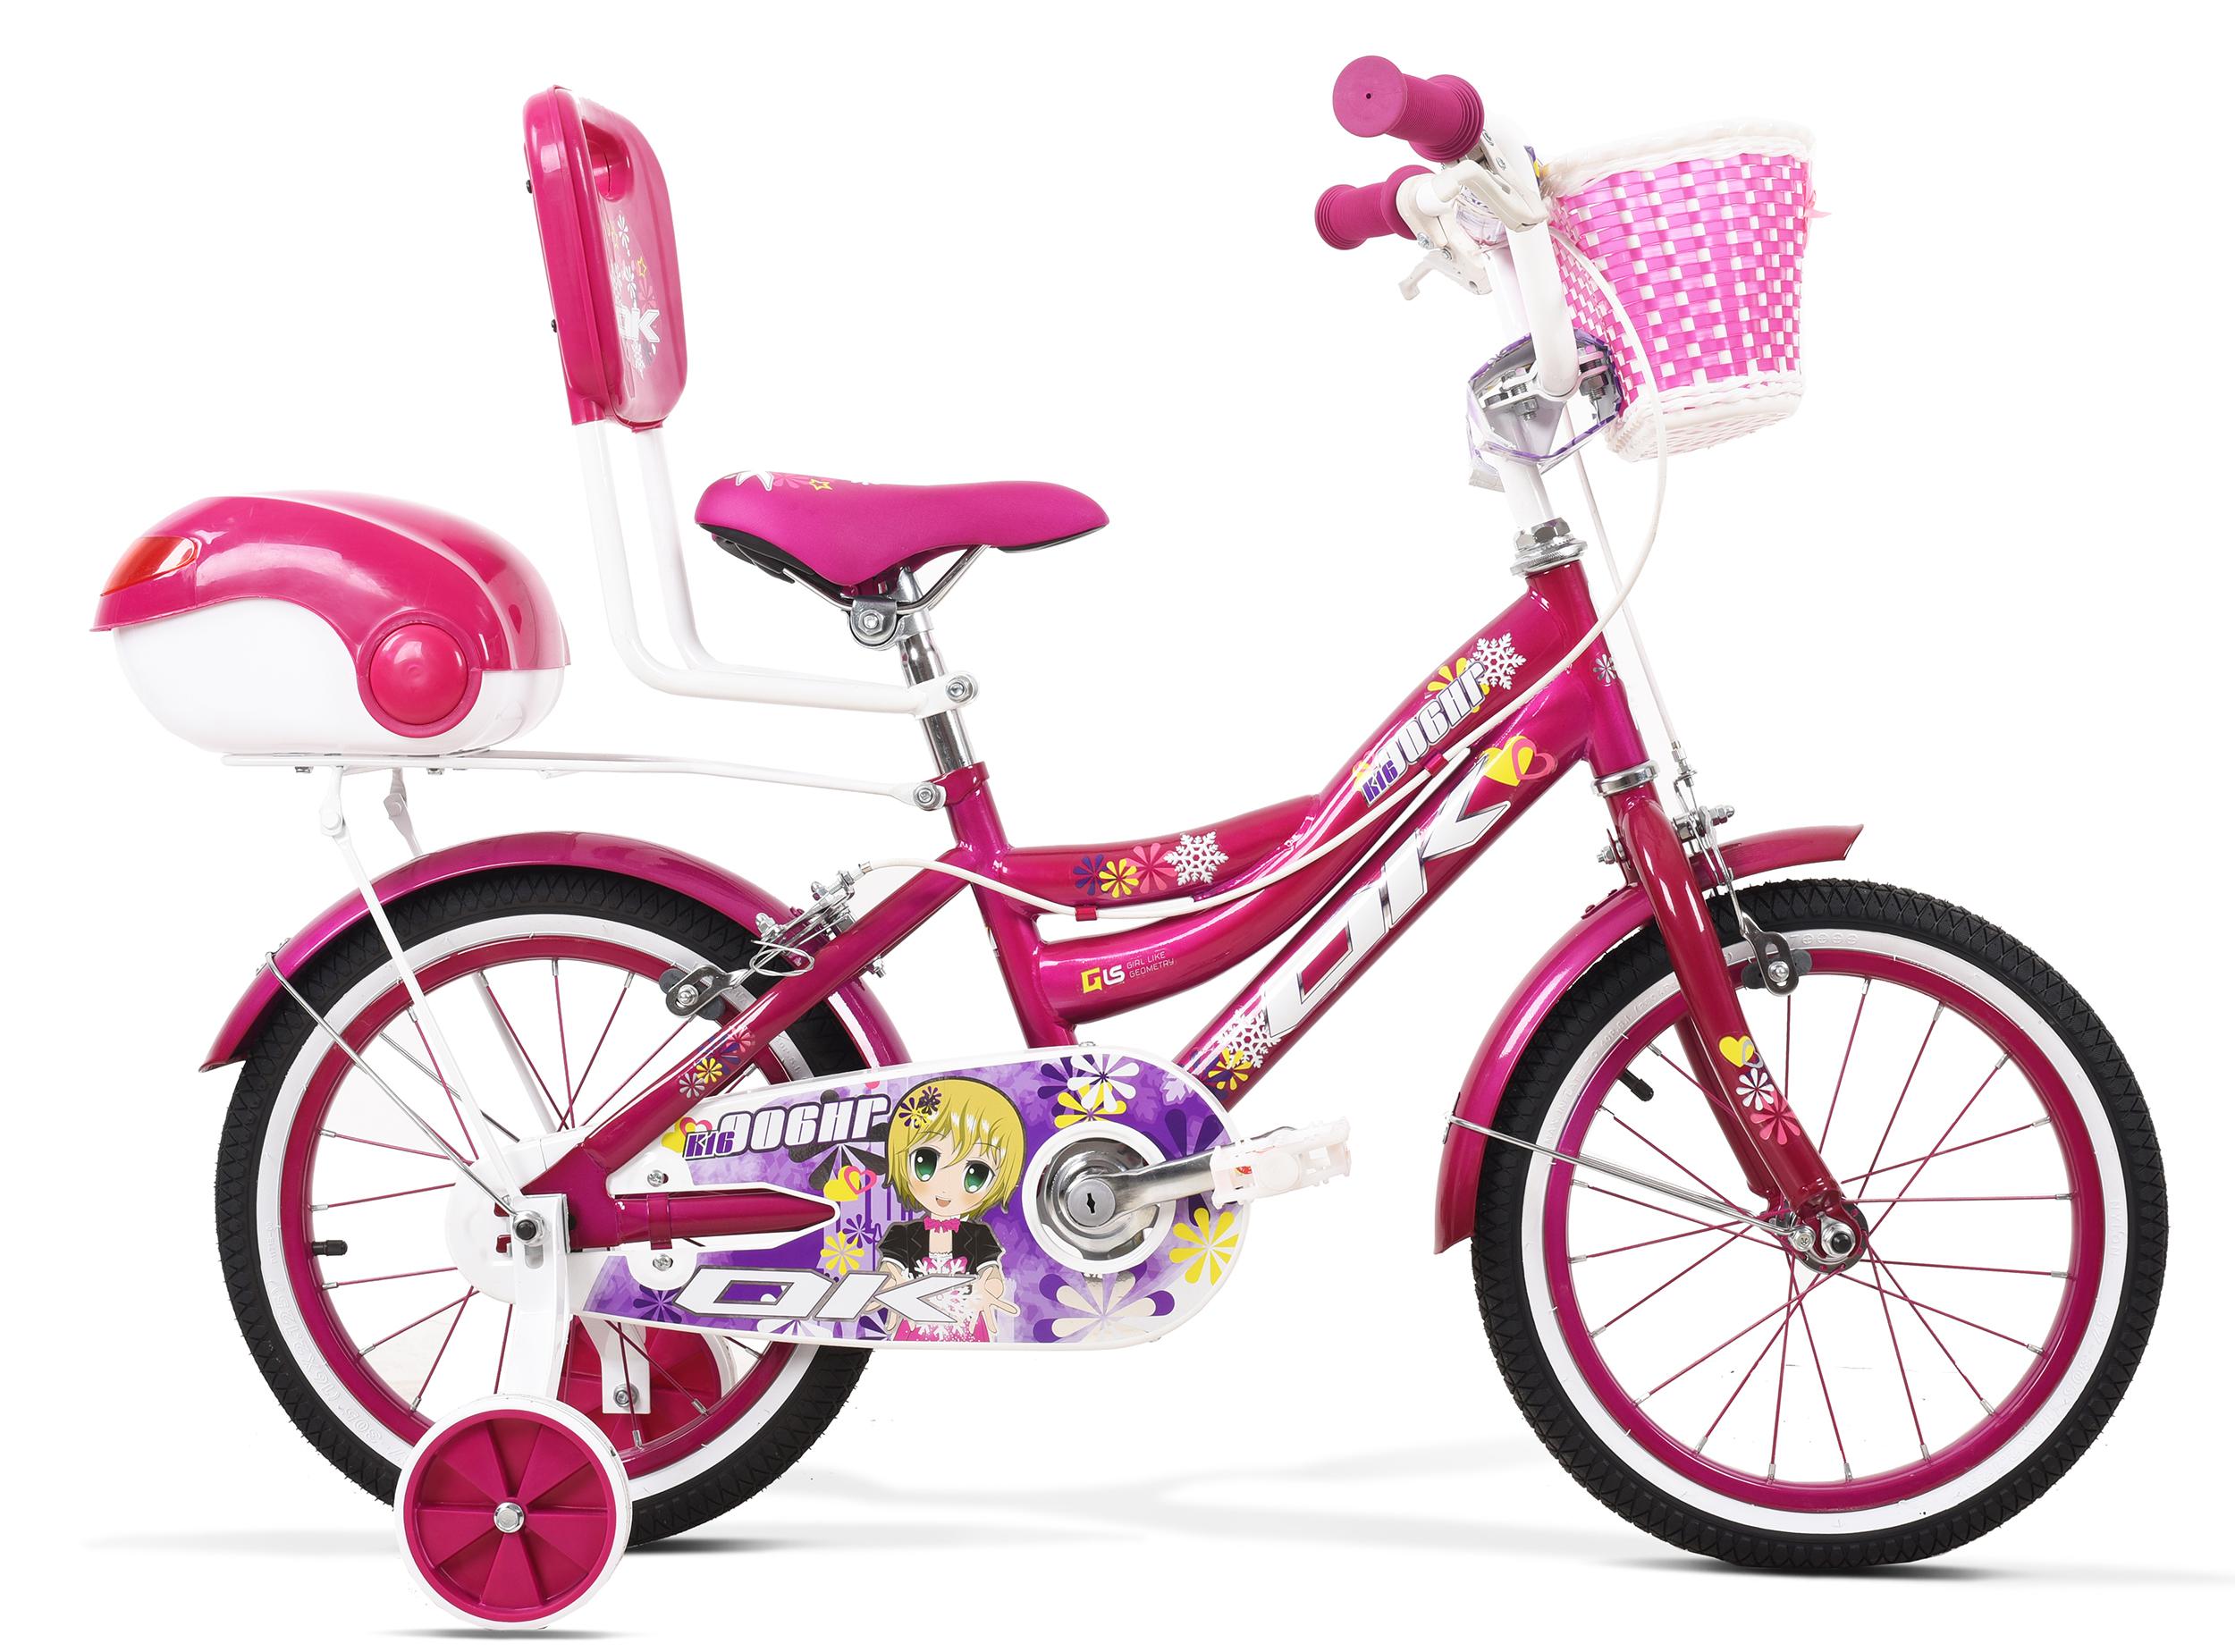 دوچرخه سایز 16 مدل K1600HR